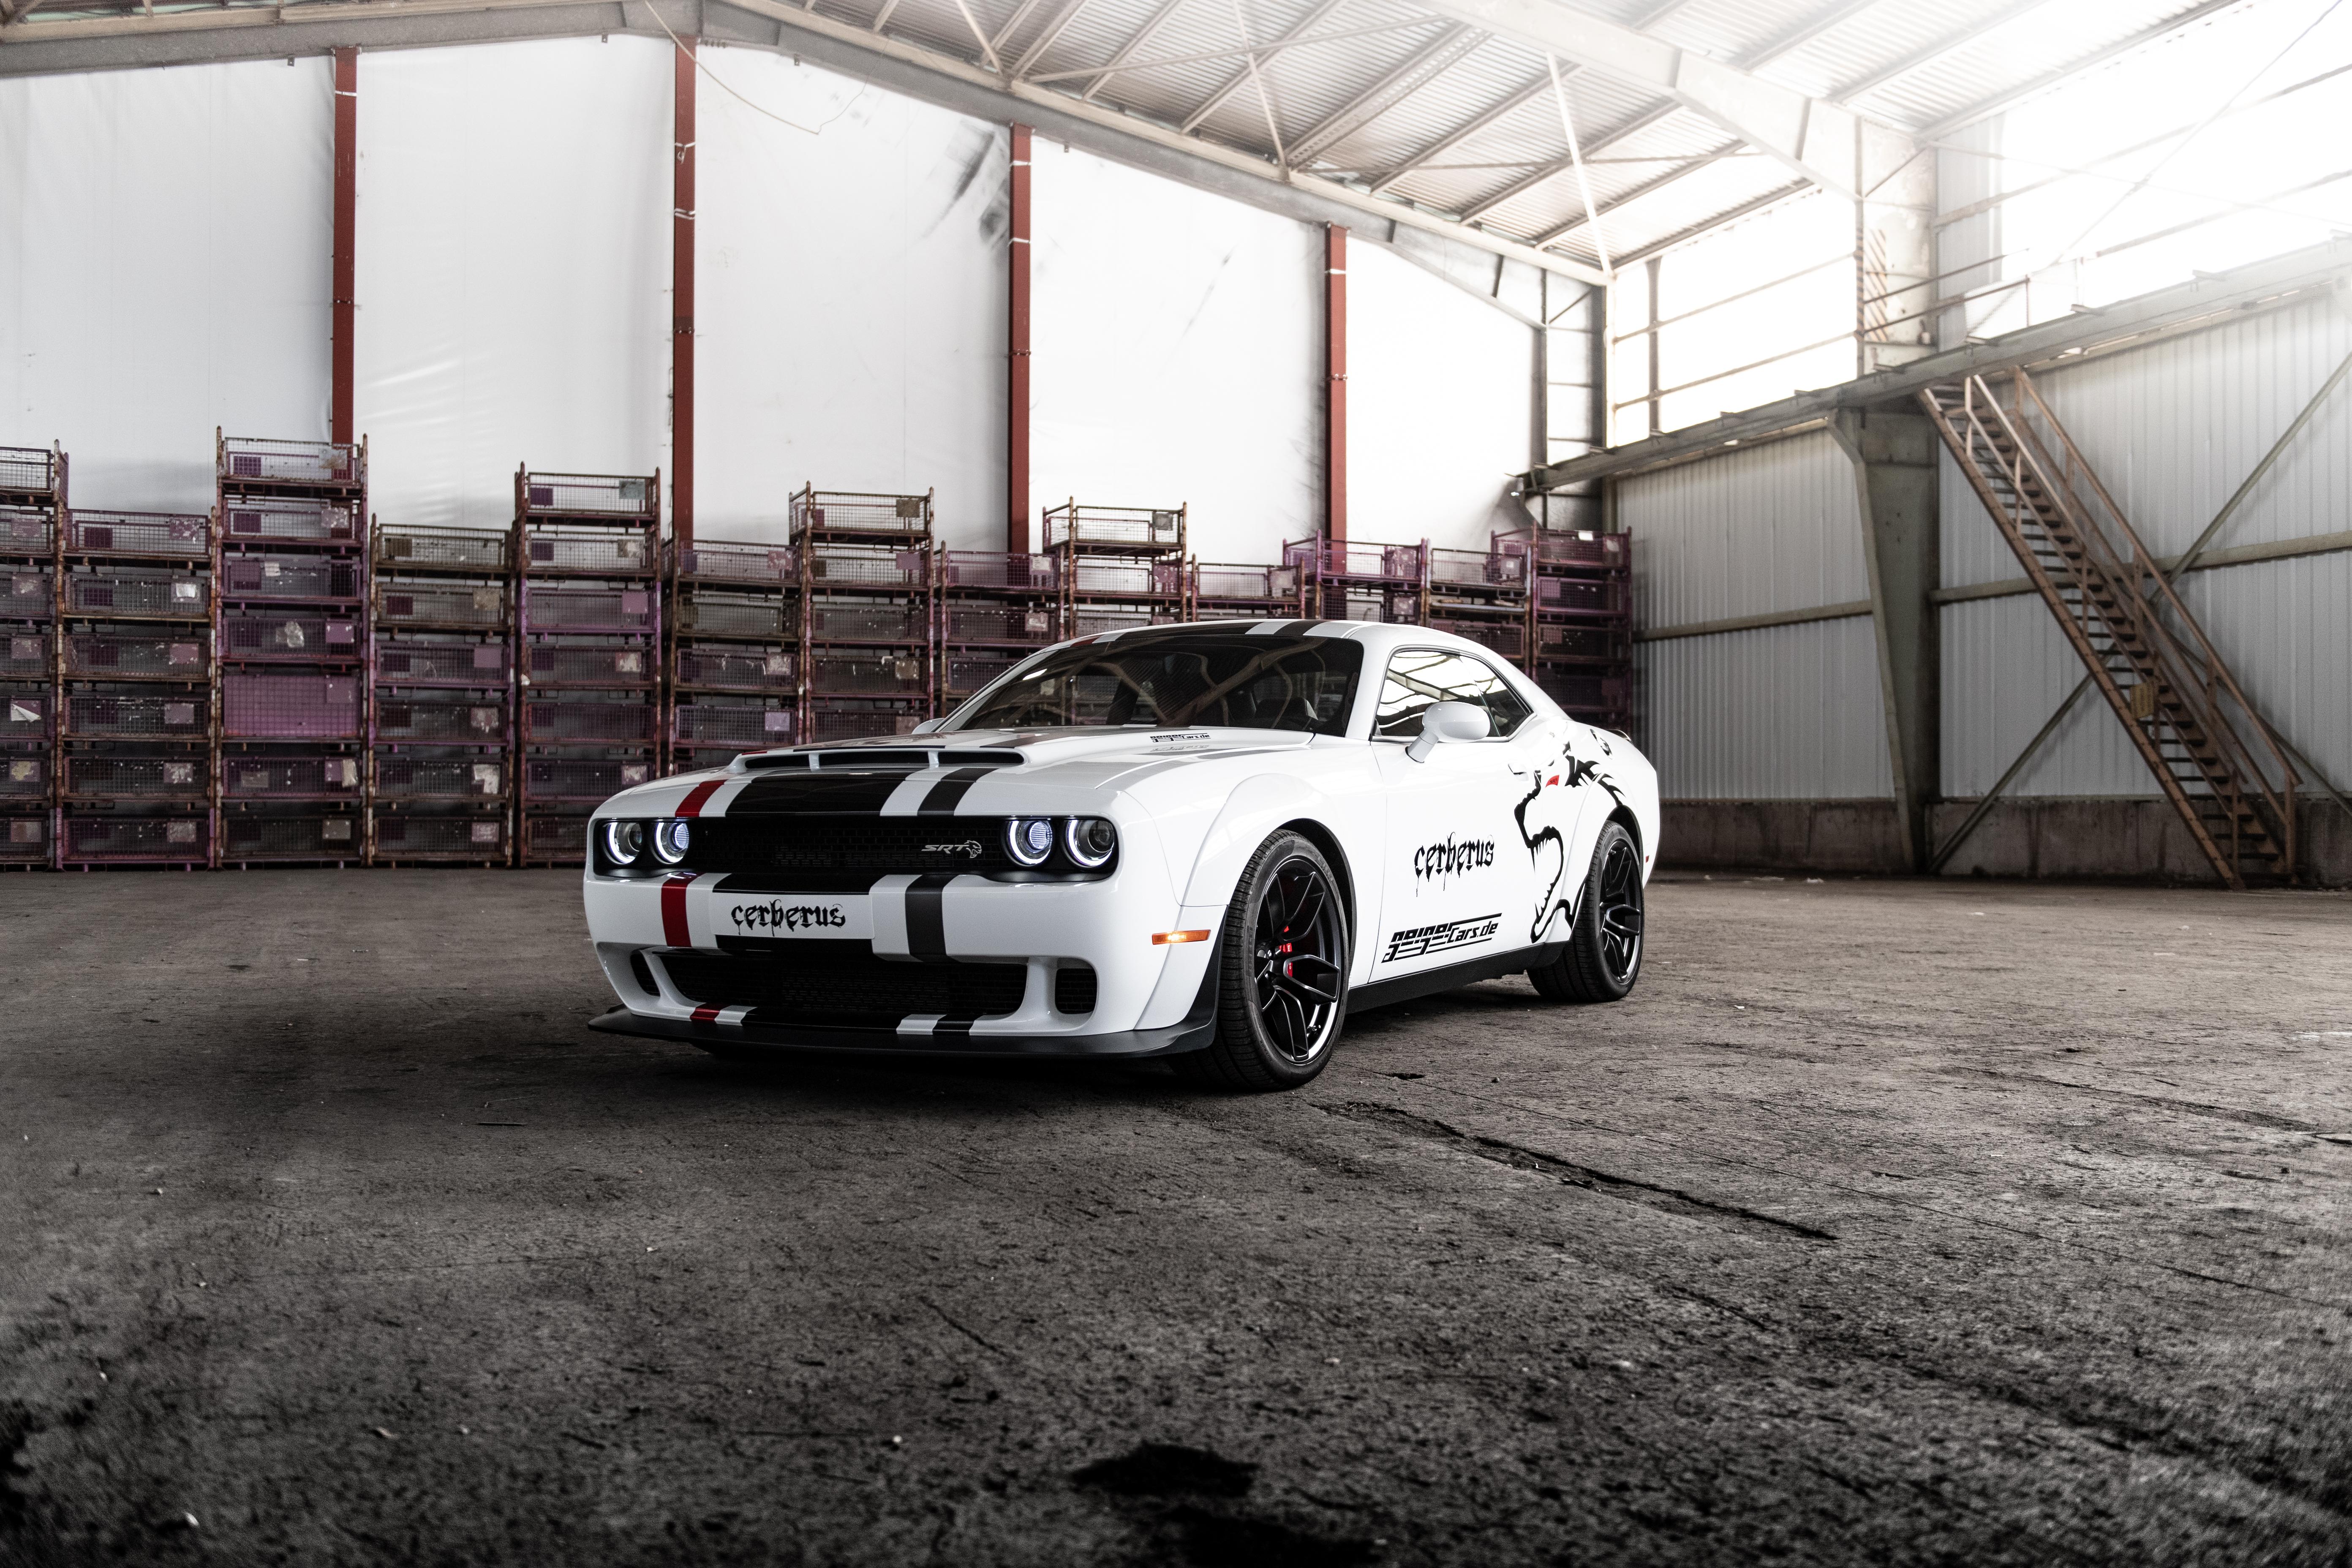 Car Dodge Dodge Challenger Dodge Challenger Srt Muscle Car Vehicle White Car 5568x3712